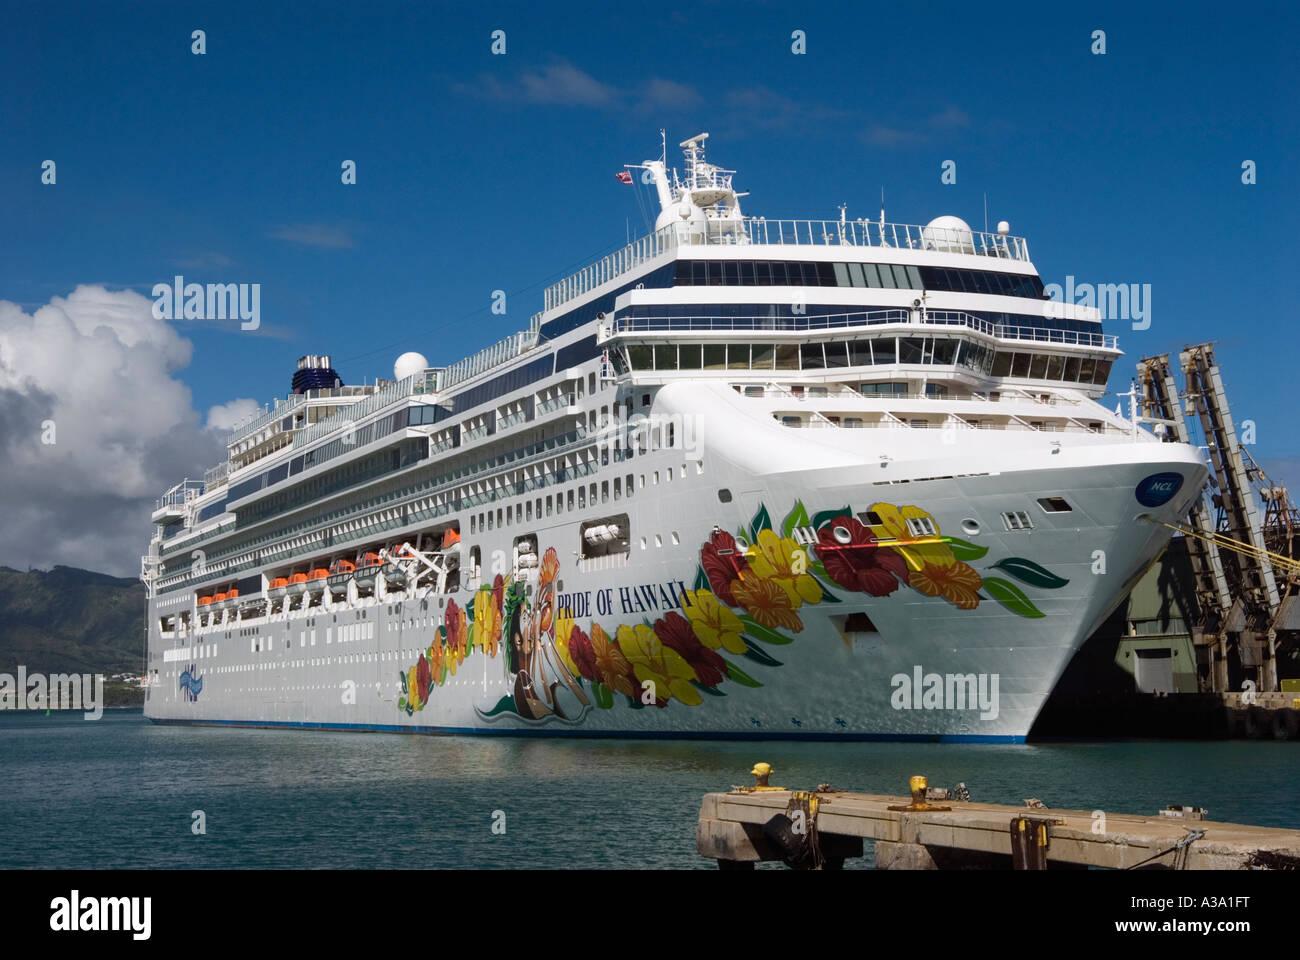 Pride Of Hawaii Cruise Ship In Maui Hawaii Stock Photo Royalty - Cruise ships hawaii